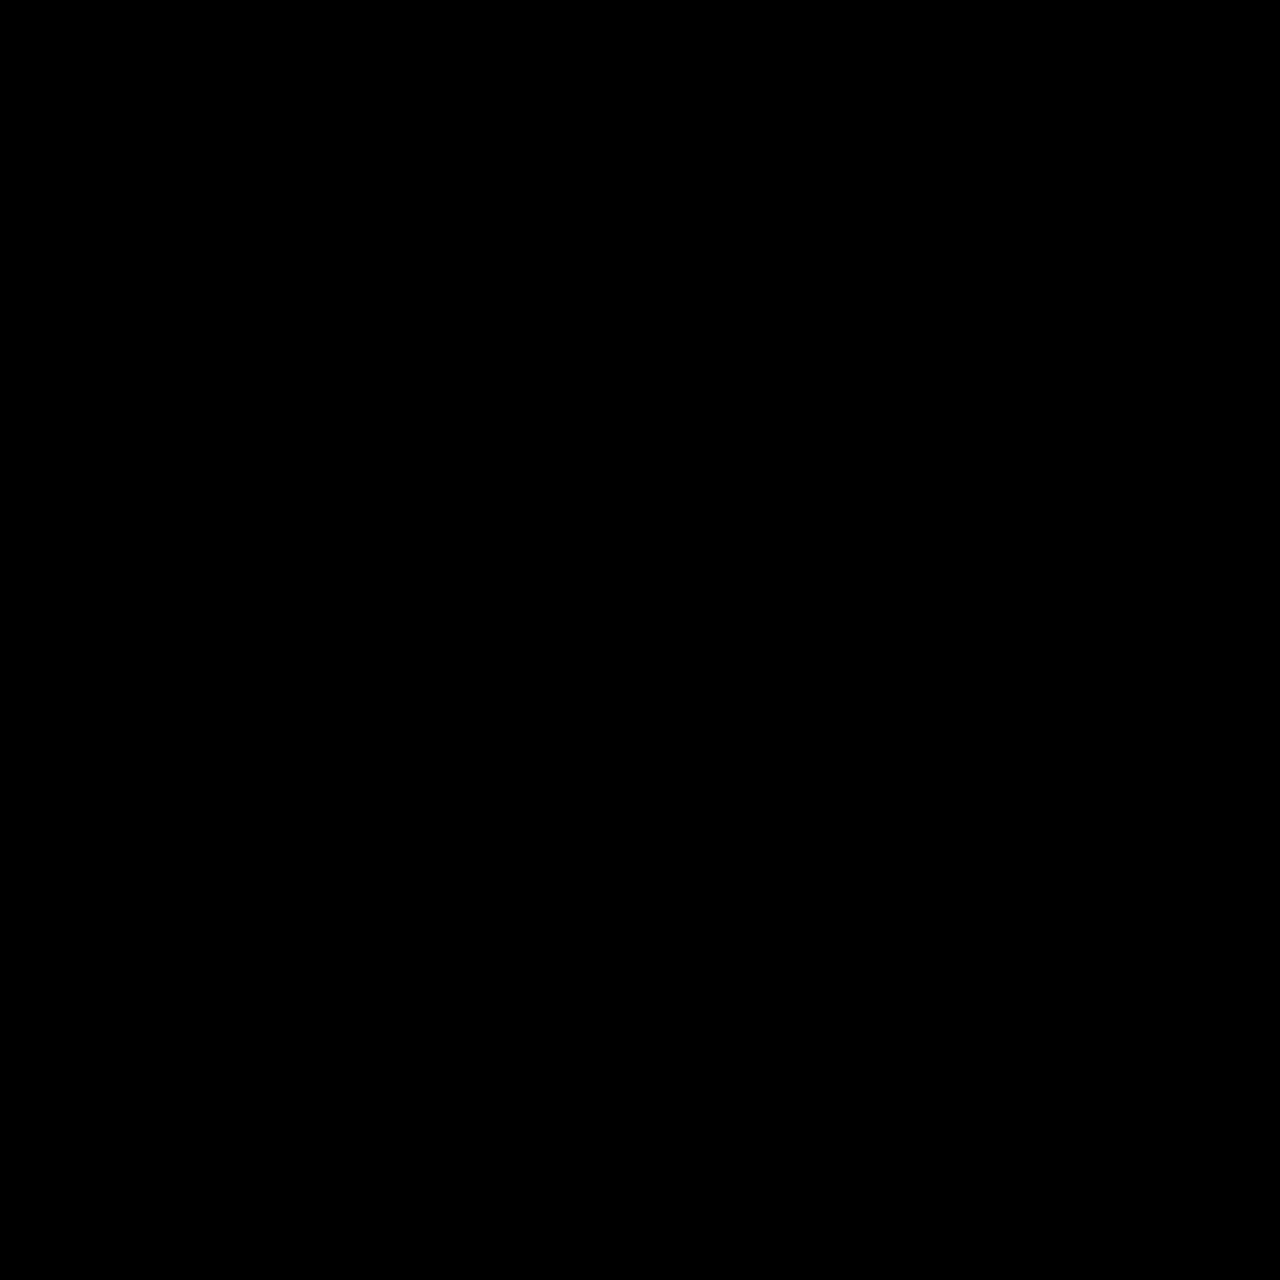 "Pickguard Blank - 3-ply Black/White/Black (12"" x 17"")"